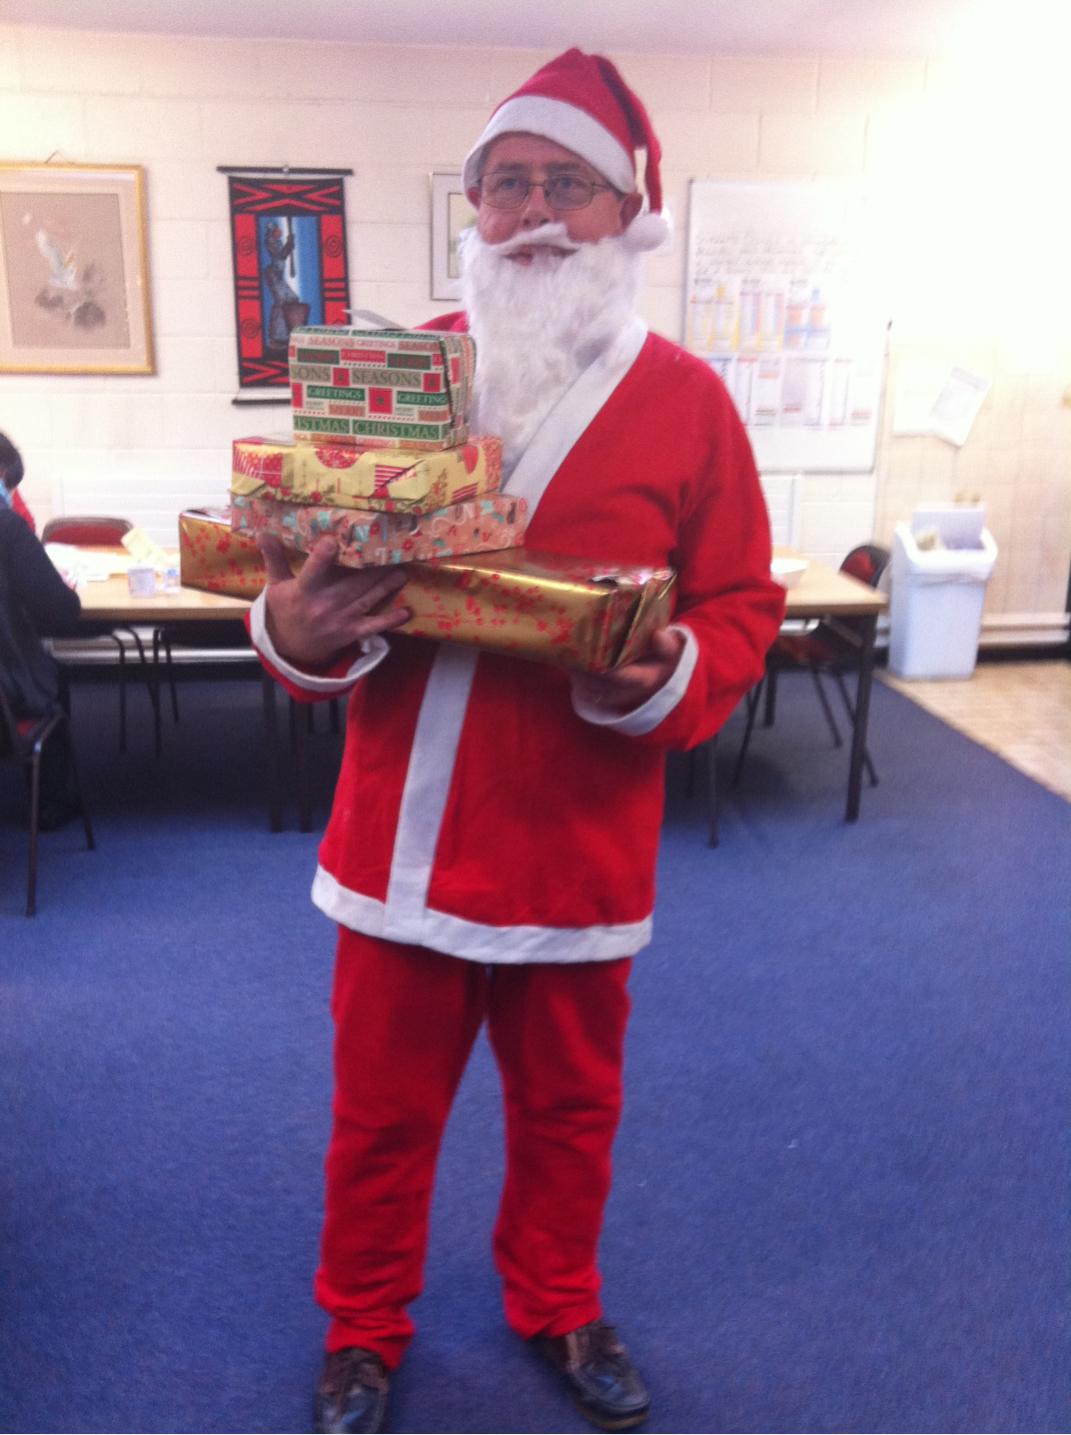 Santa arrived early in Colaiste Chiarain!!